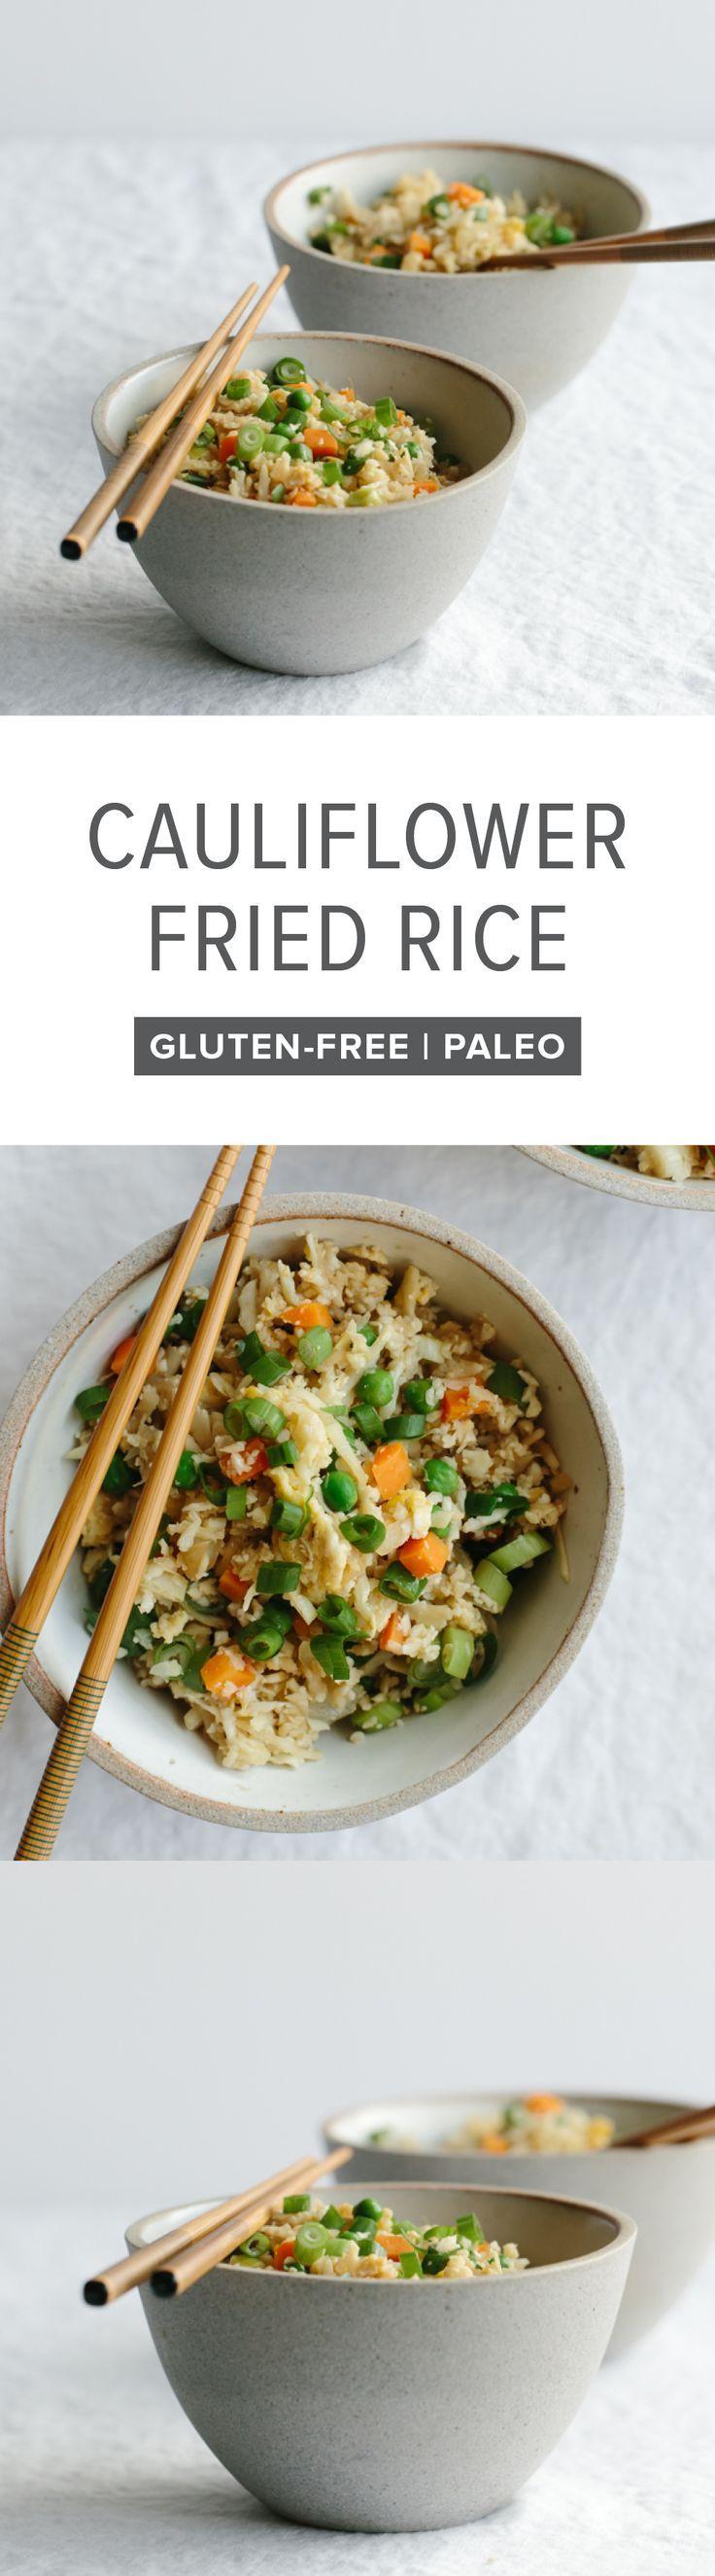 (gluten-free, paleo) Cauliflower fried rice is a healthier alternative to the much loved Chinese stir fry favorite.